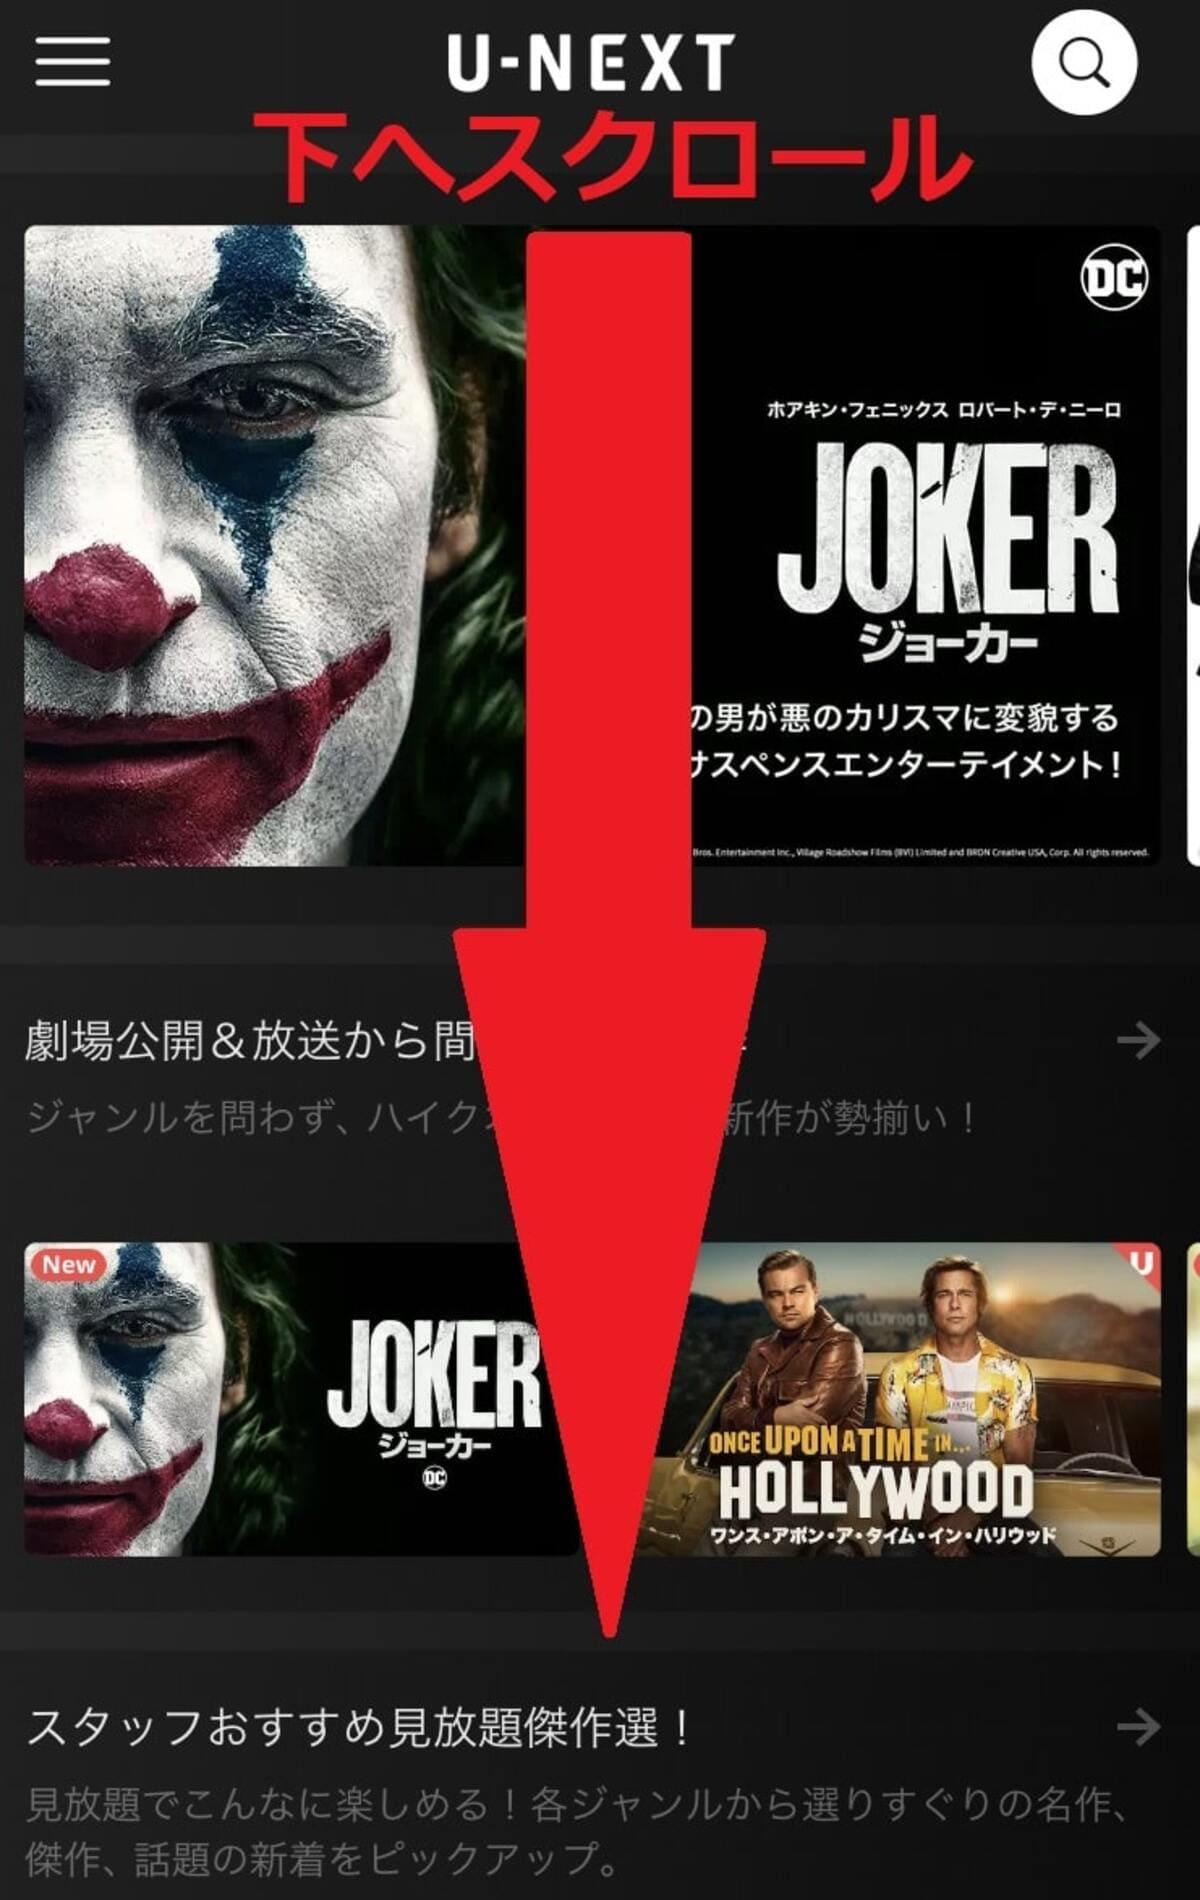 U-NEXTで好きな動画を見る検索方法は簡単